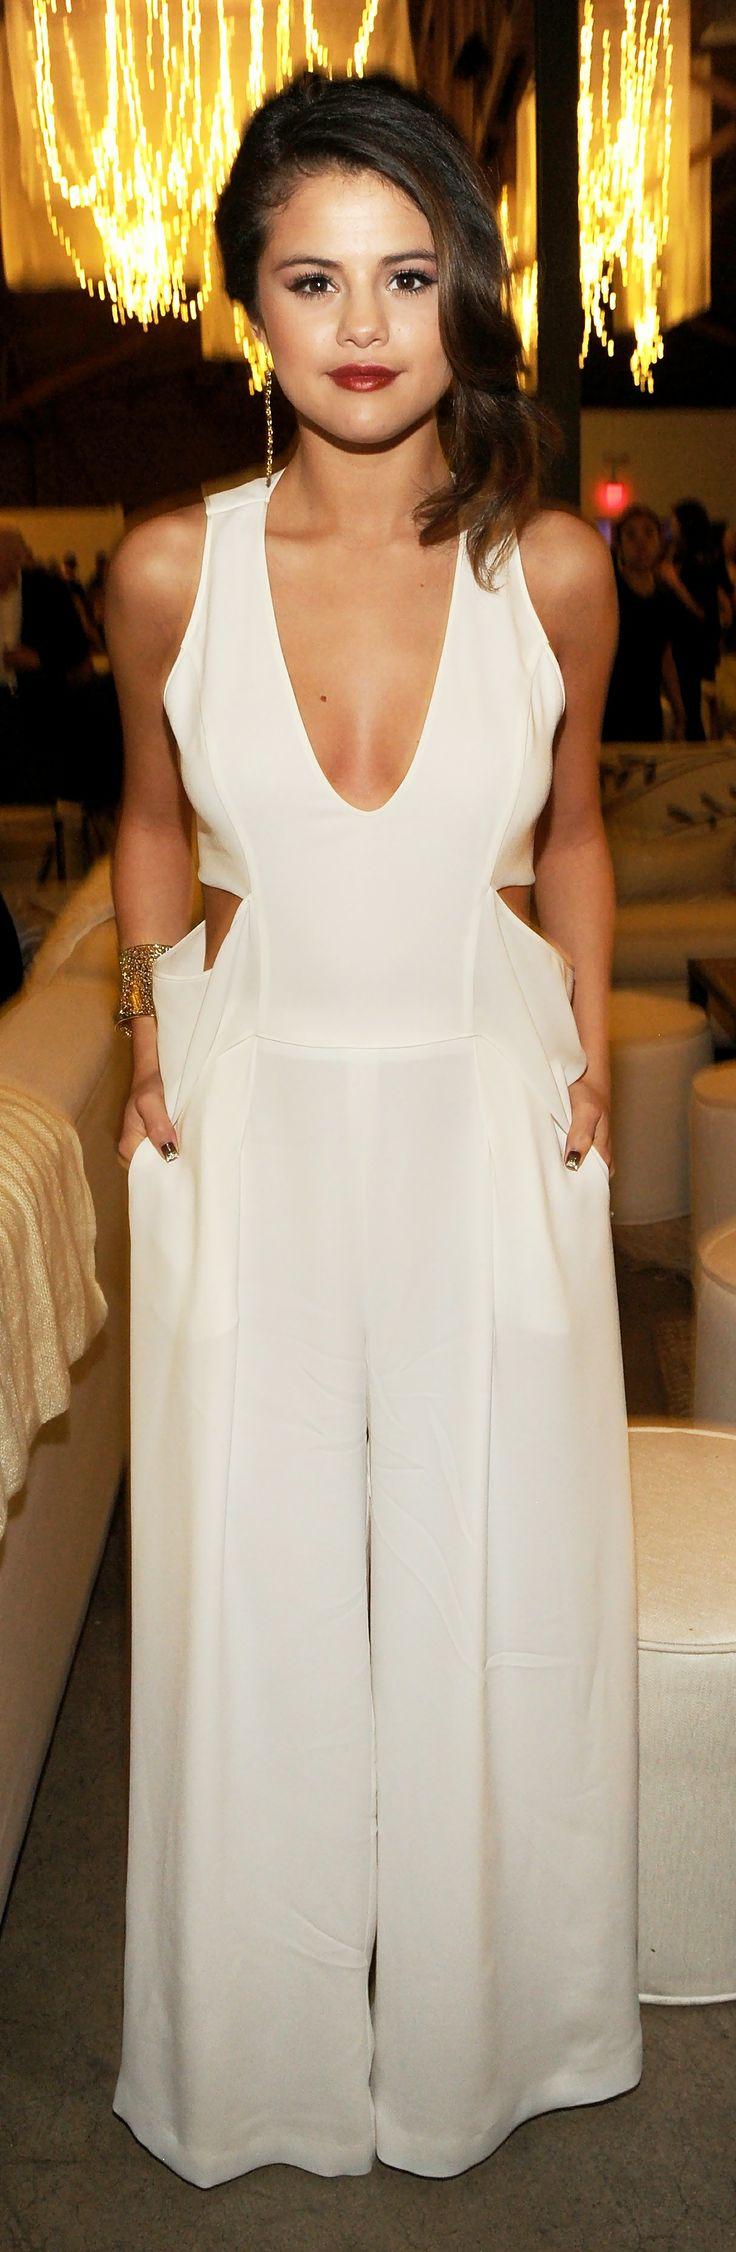 Selena Gomez LIKE | PIN | FOLLOW! #skirt #dress #pants #shorts #bikini #sunglasses #shoes #lingerie #hair #bag #crochet #tattoo #gold #kiss #sex #sexy #hot #girl #woman #sensual #like #erotic #fashion